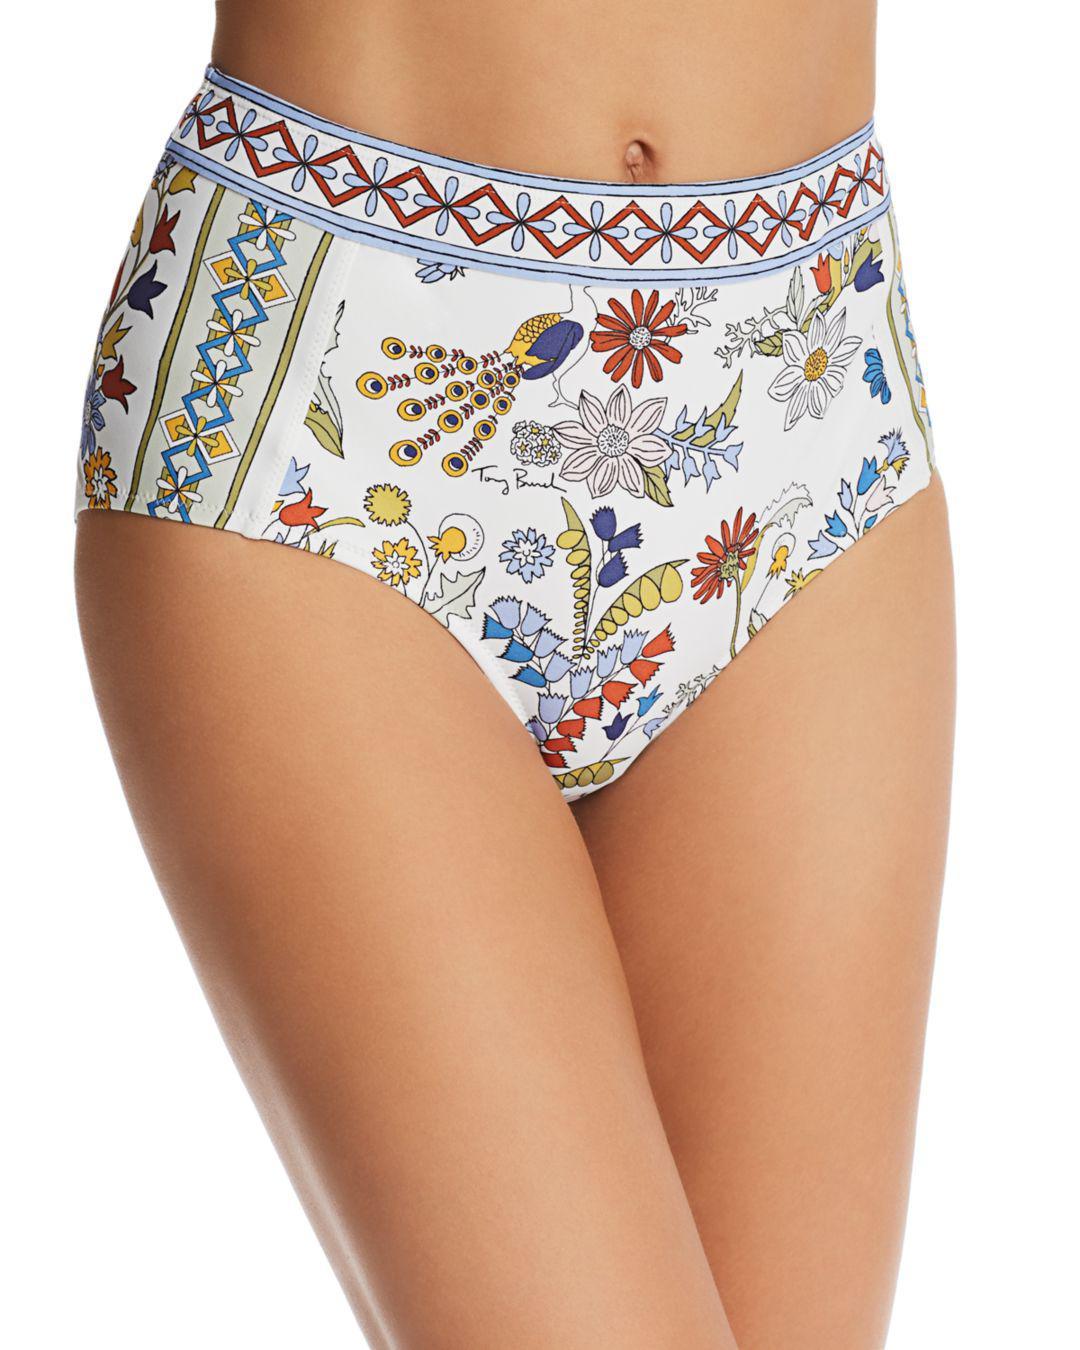 0984d6d65cf6 Tory Burch. Women s Meadow Folly High-waist Bikini Bottom